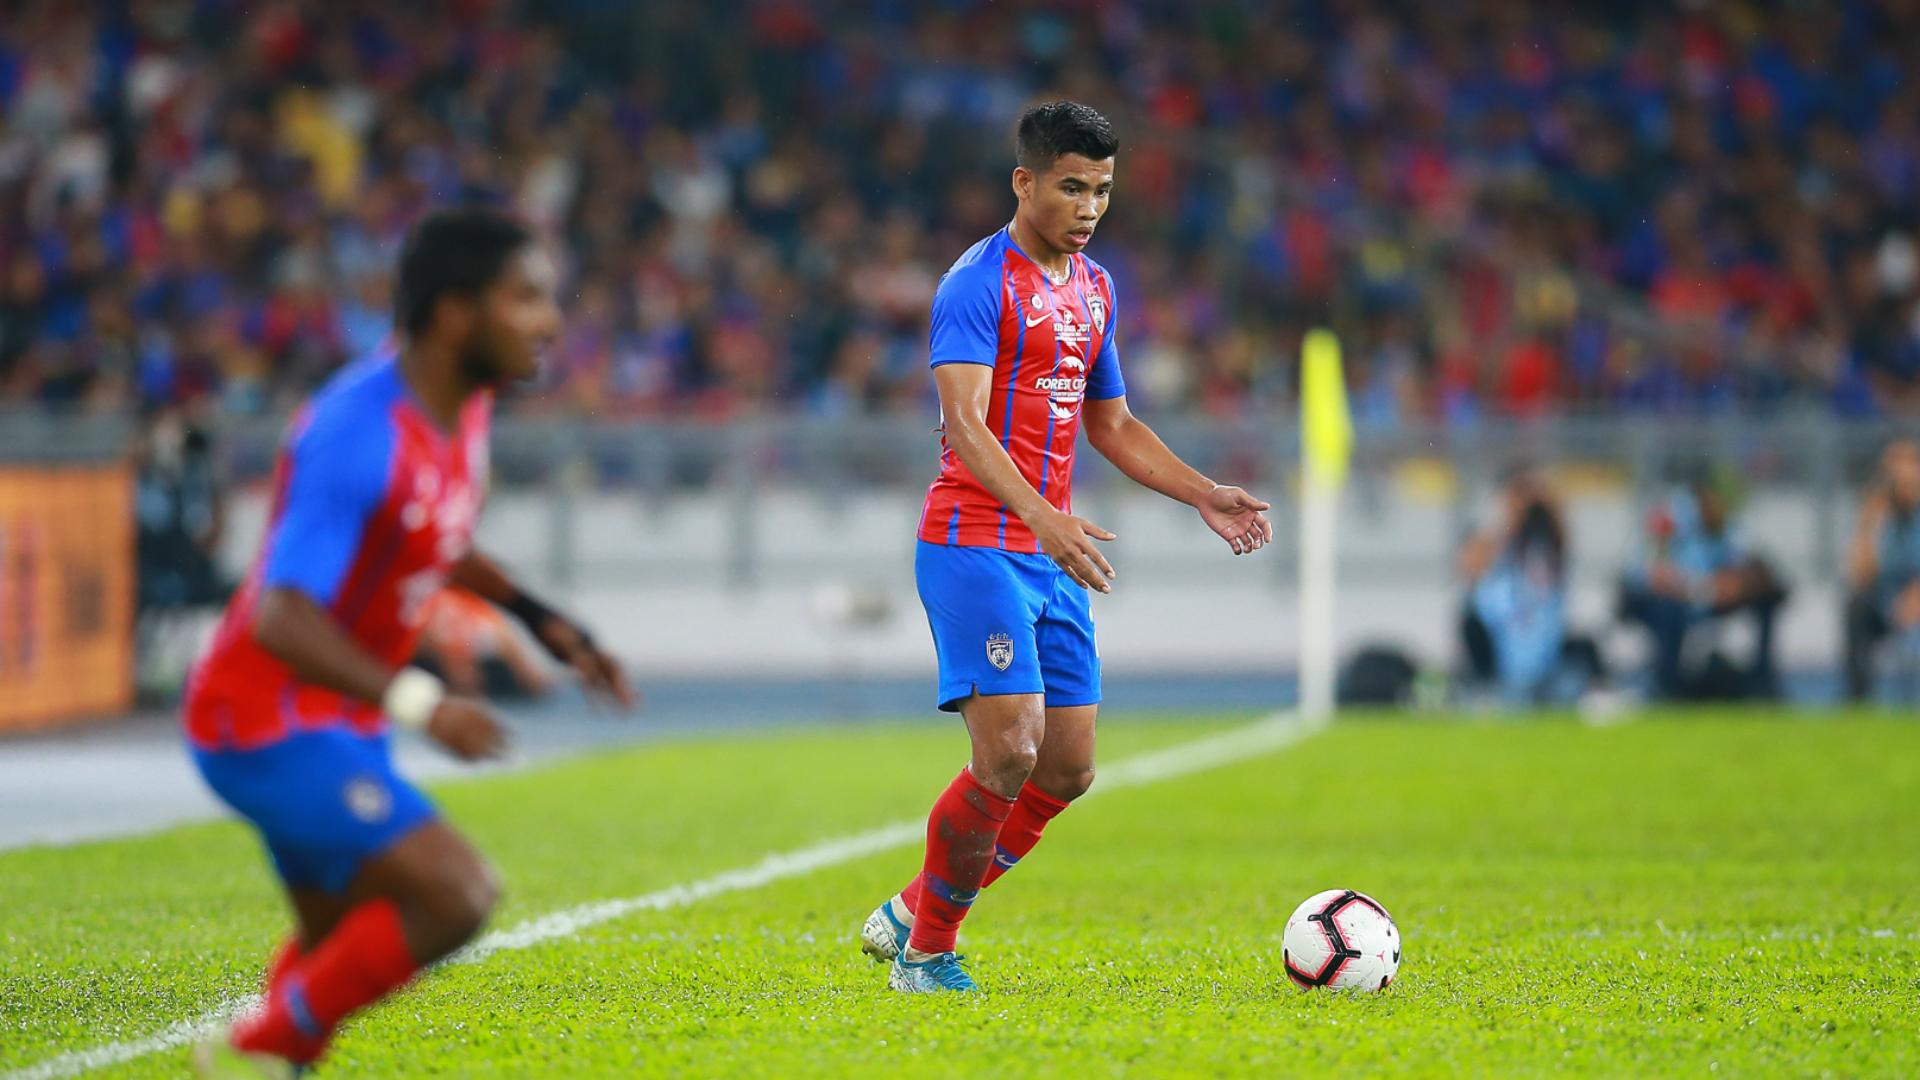 Safawi Rasid, Kedah v Johor Darul Ta'zim, Malaysia Cup final, 2 Nov 2019